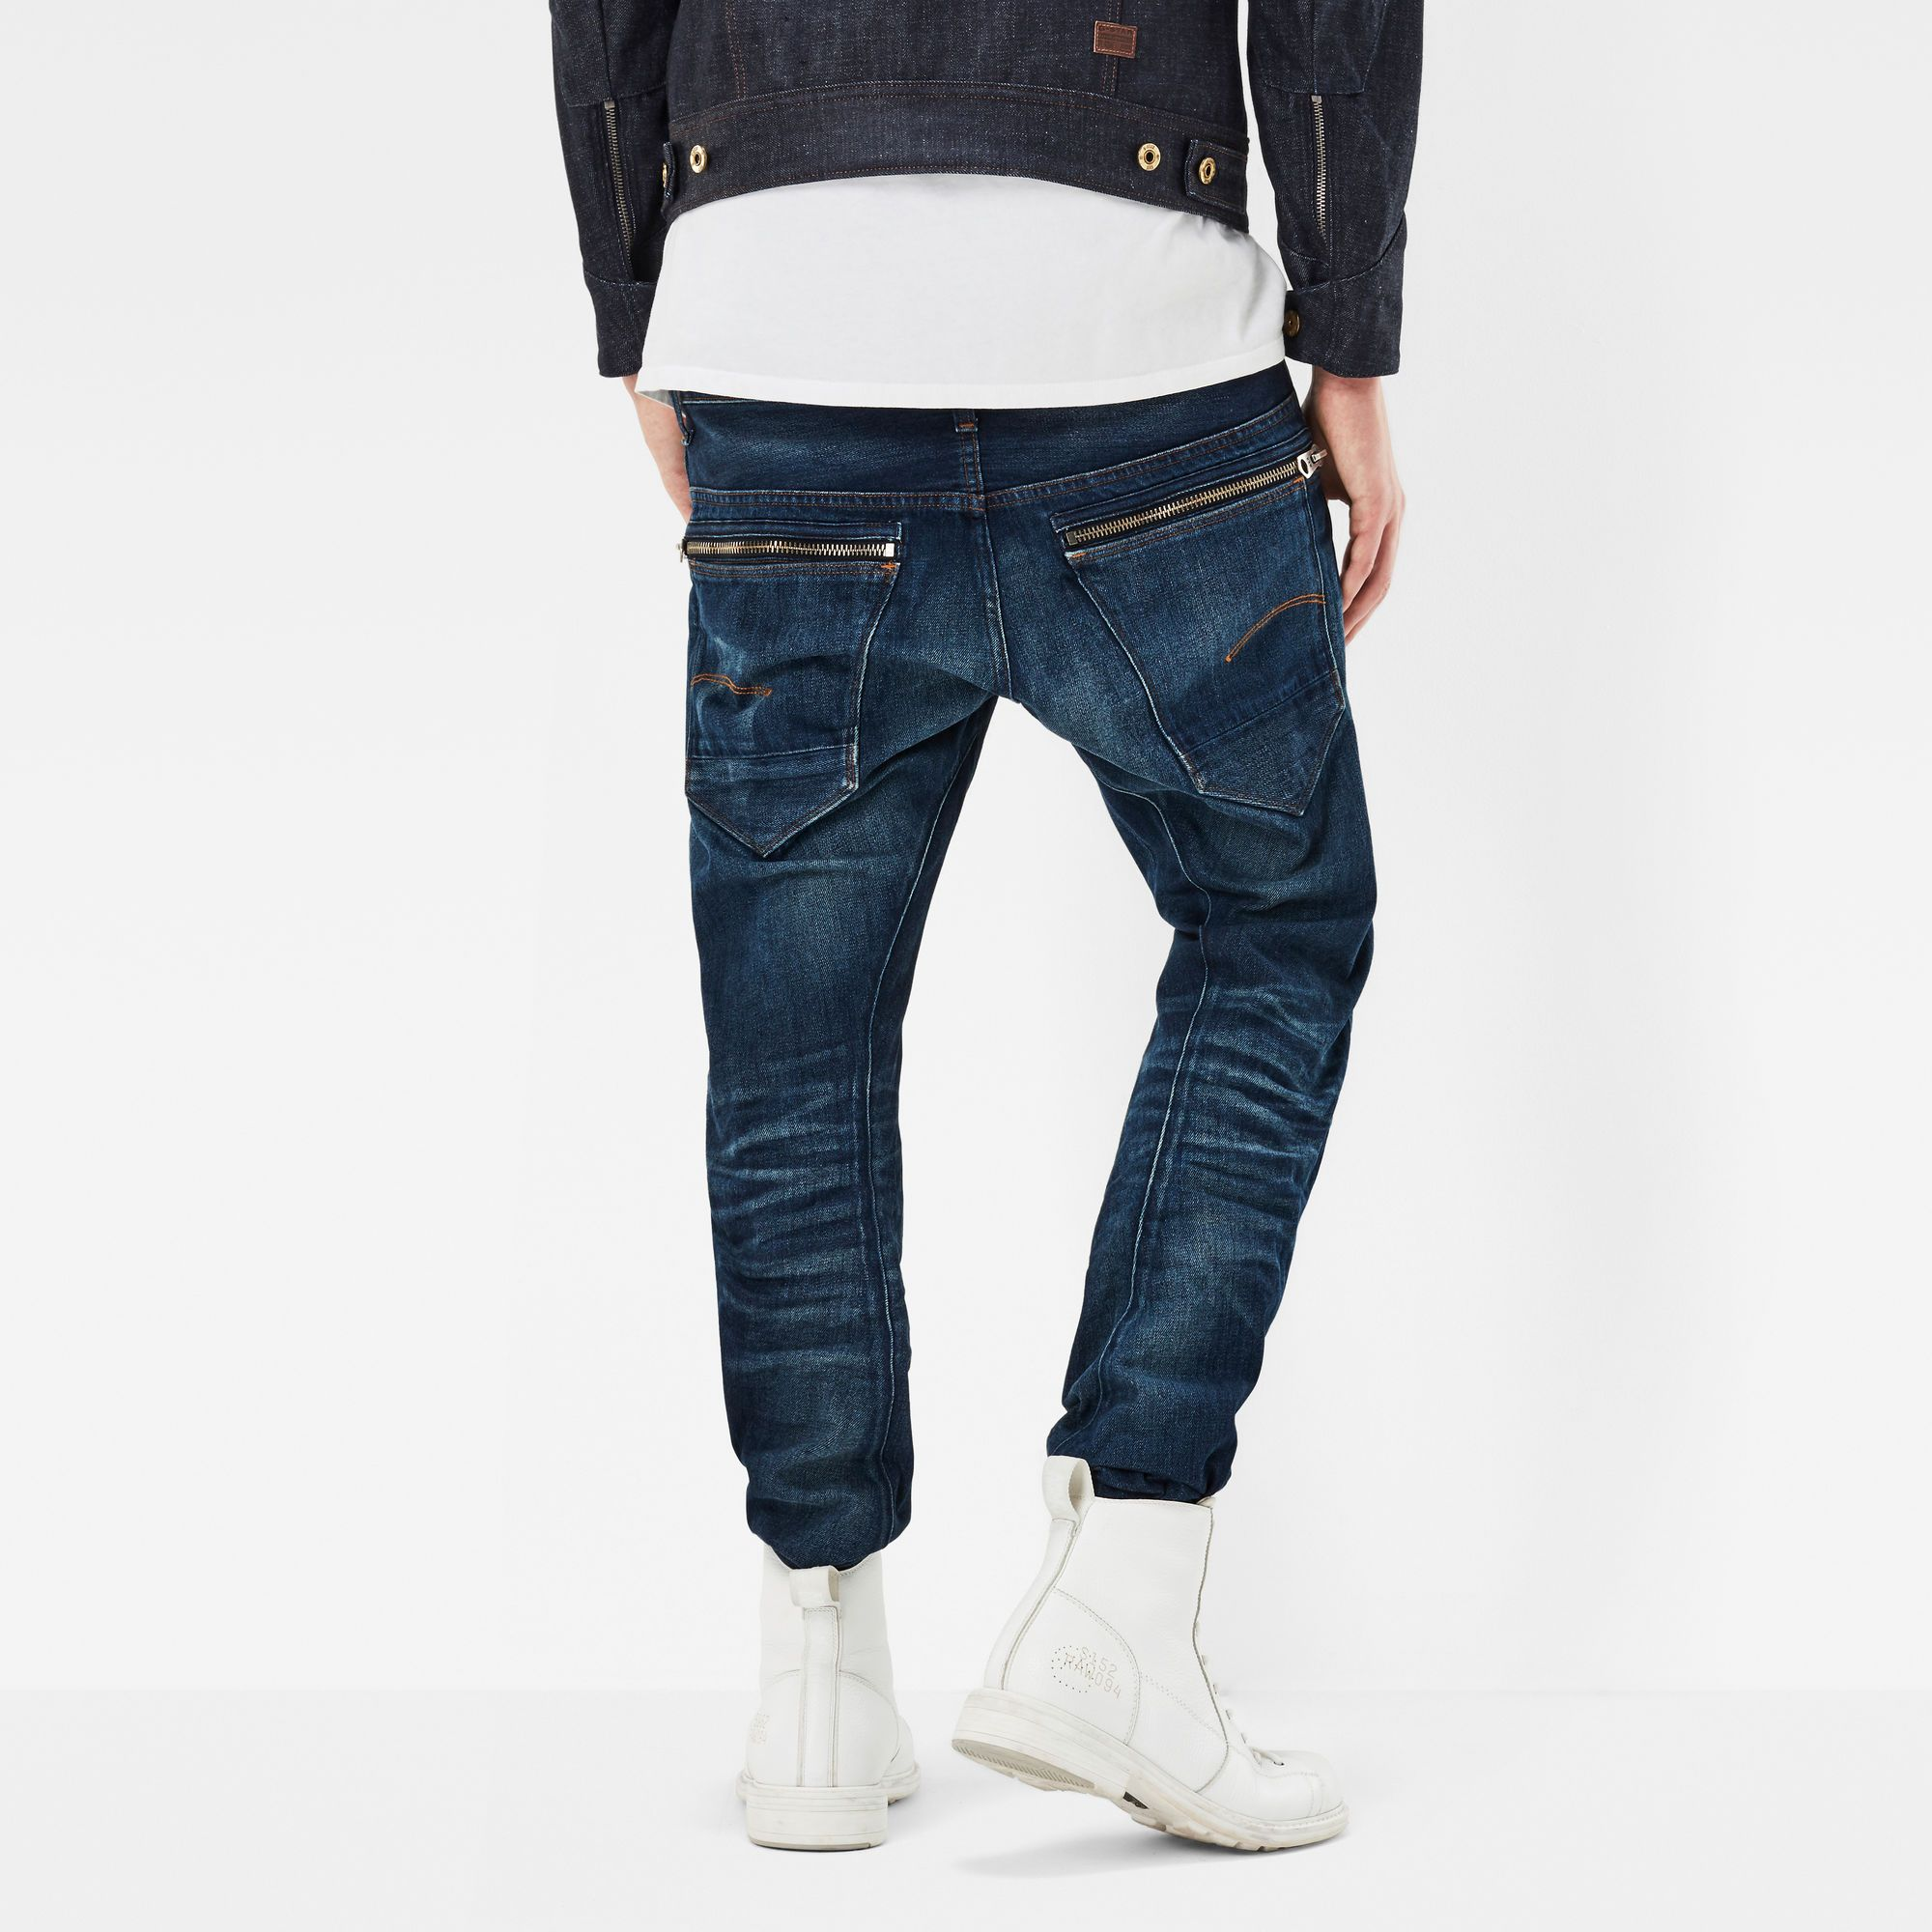 G-Star RAW Arc Zip 3D Slim Jeans